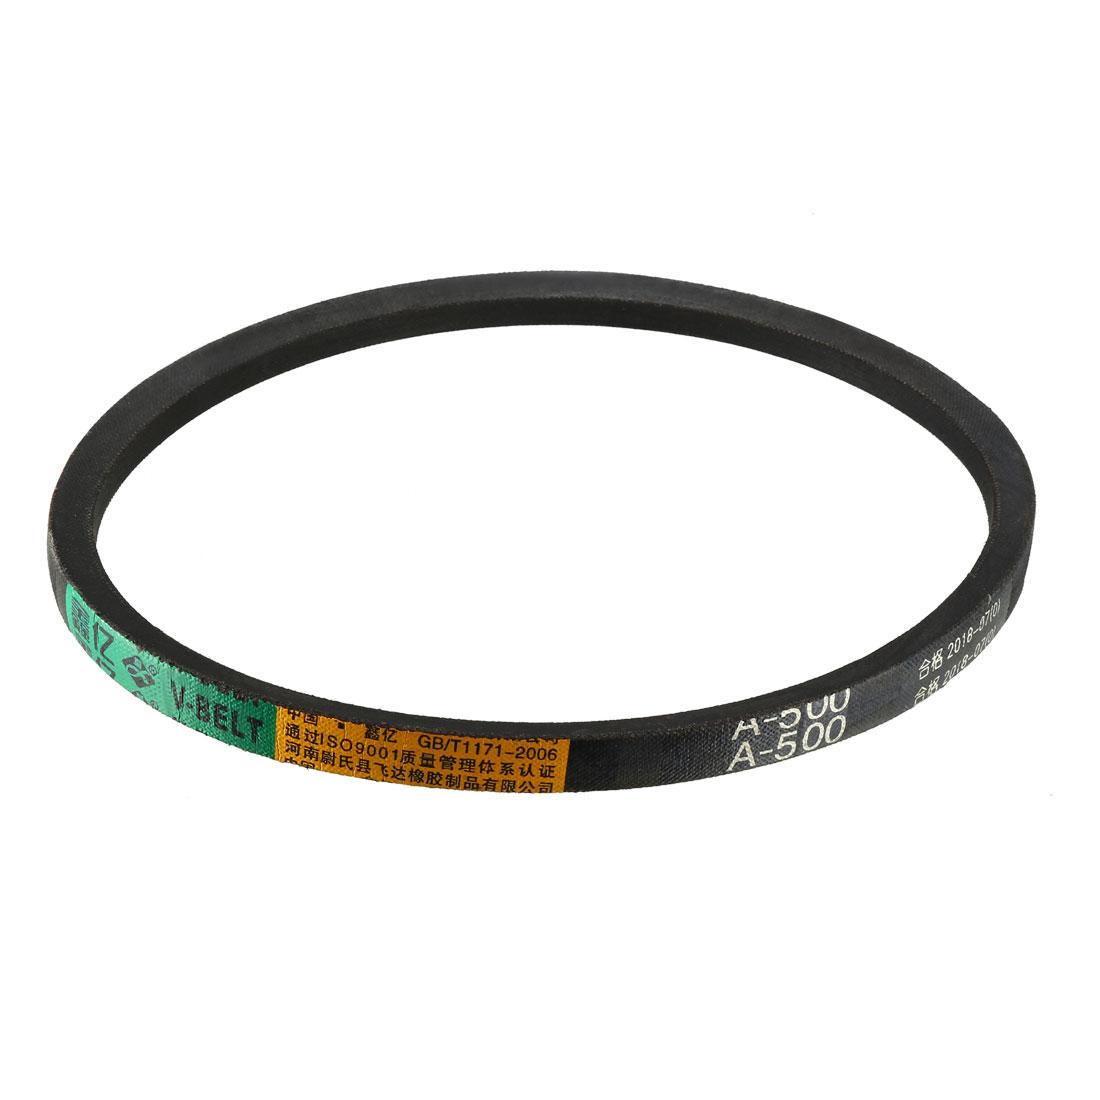 A-500/A20 Drive V-Belt Inner Girth 20-inch Industrial Power Rubber Belt